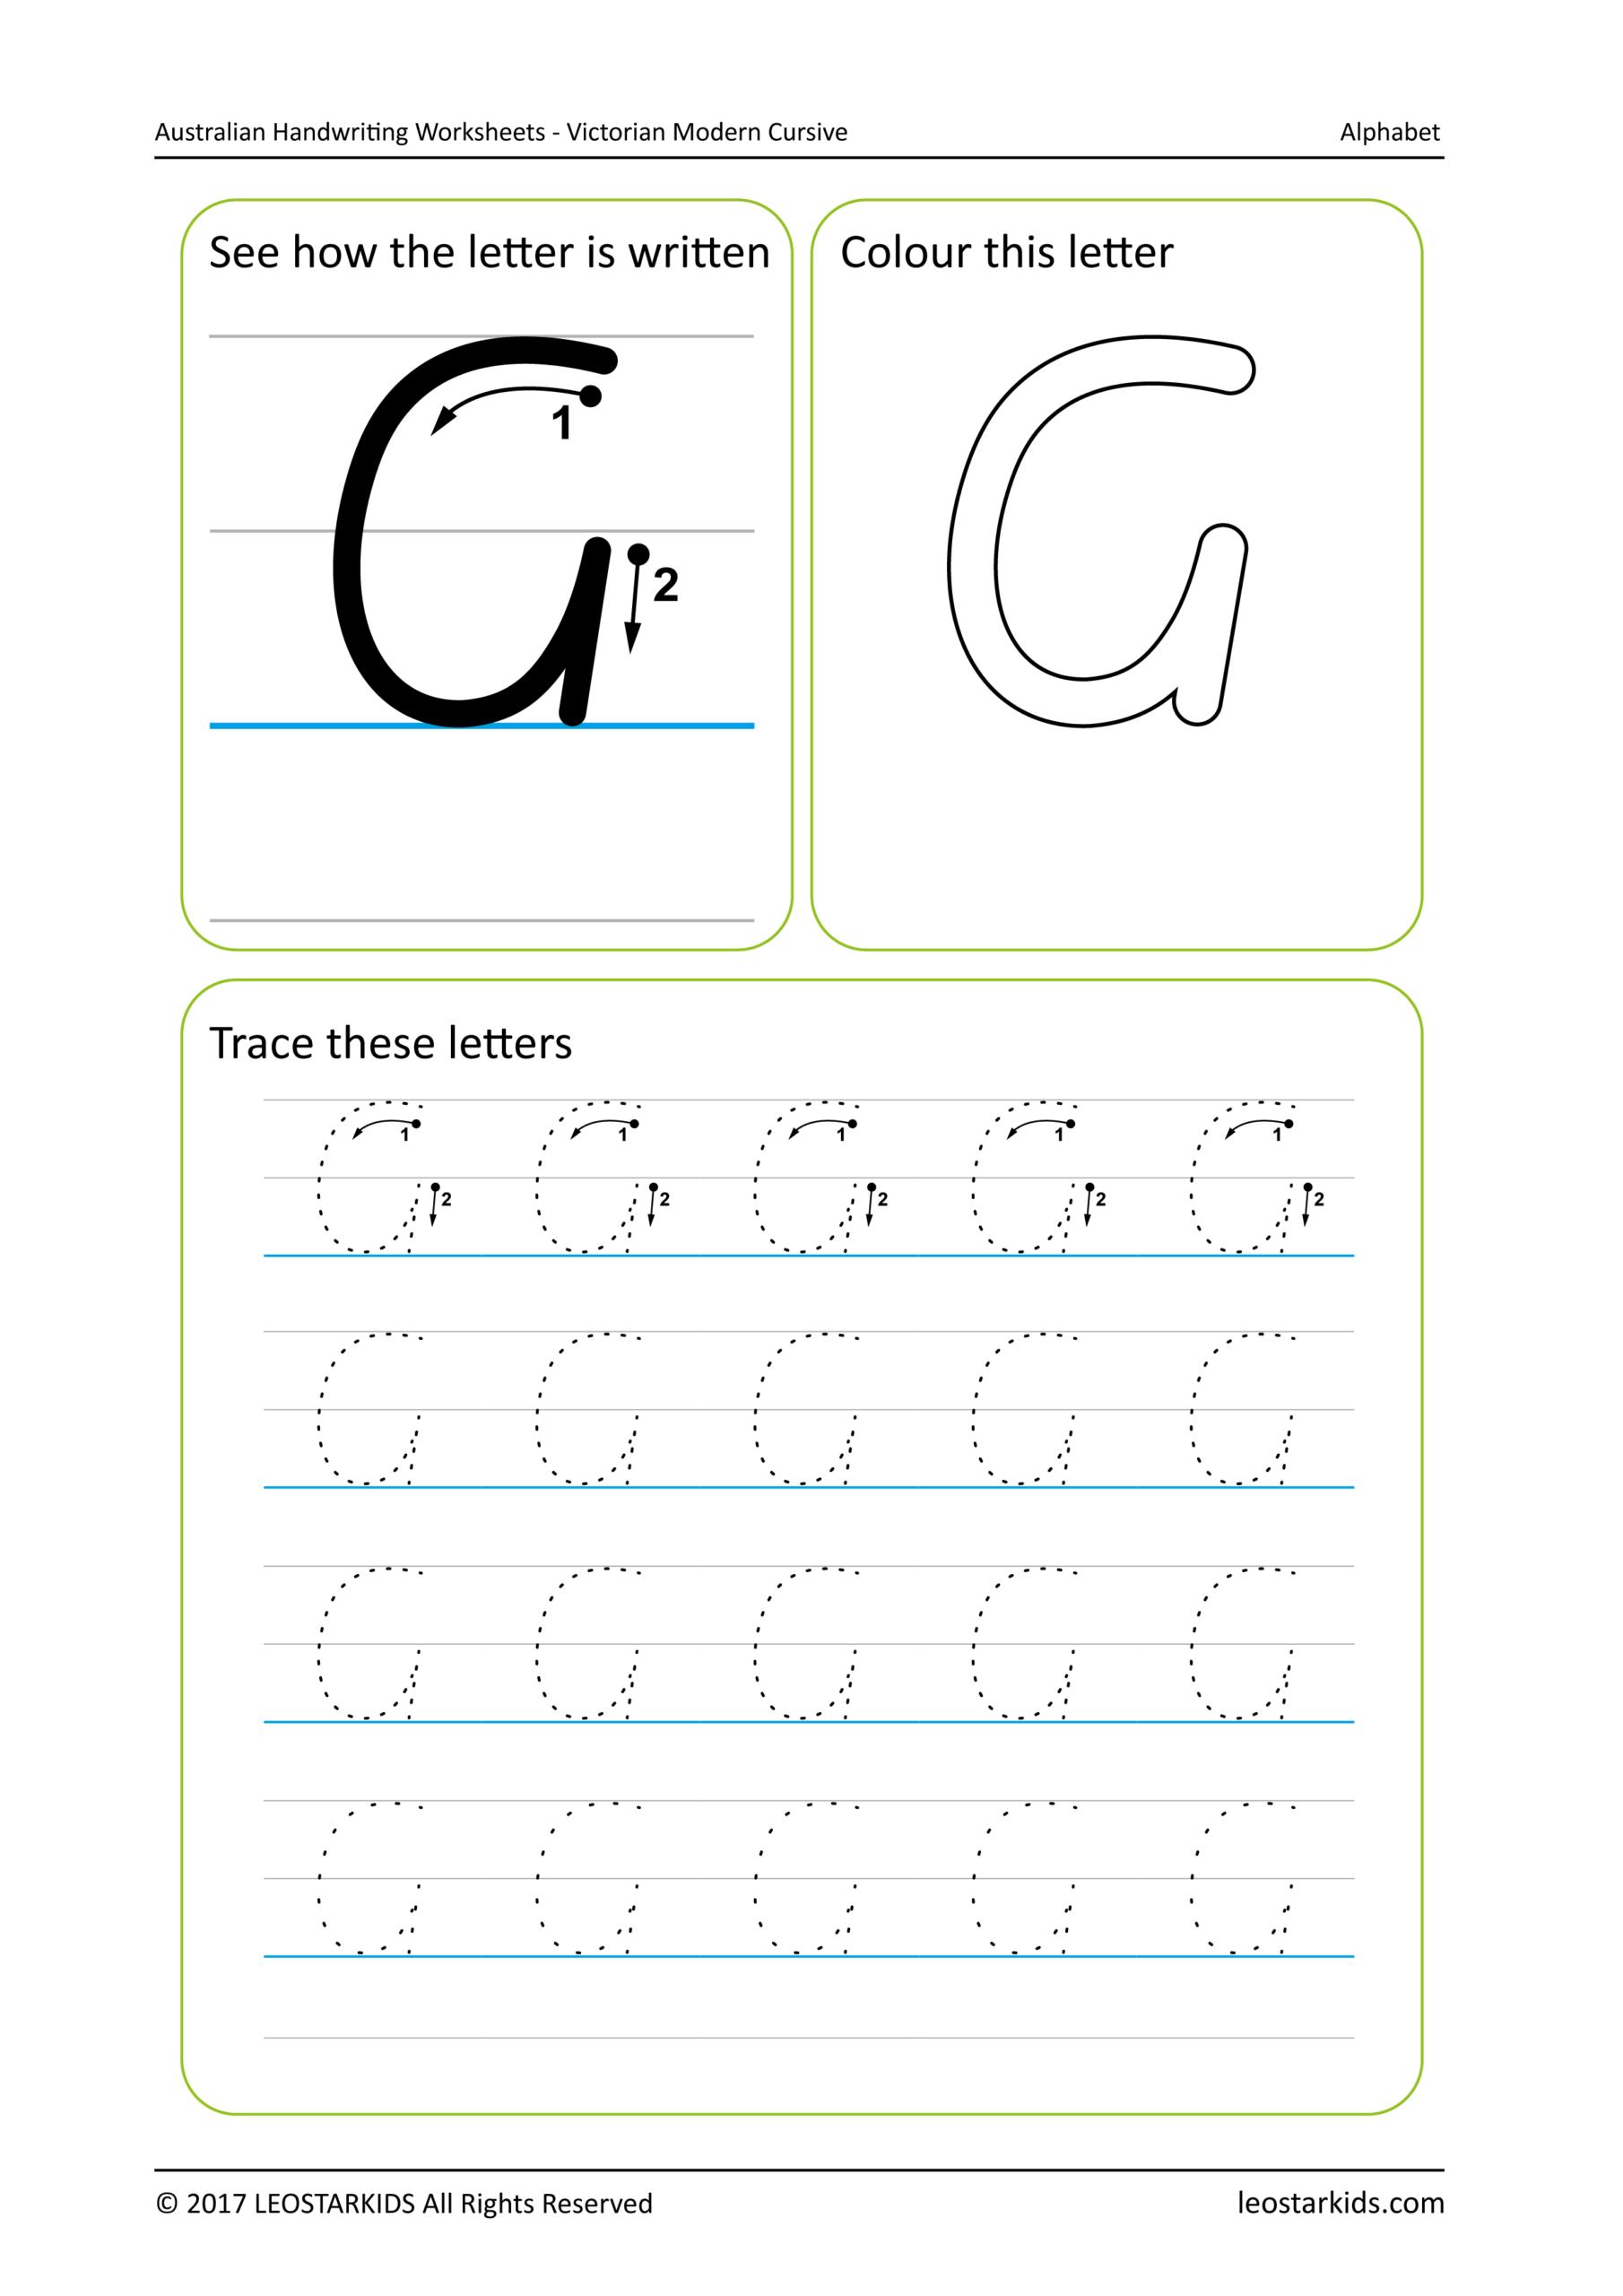 Australian Handwriting Worksheets - Victorian Modern Cursive regarding Name Tracing Template Qld Font